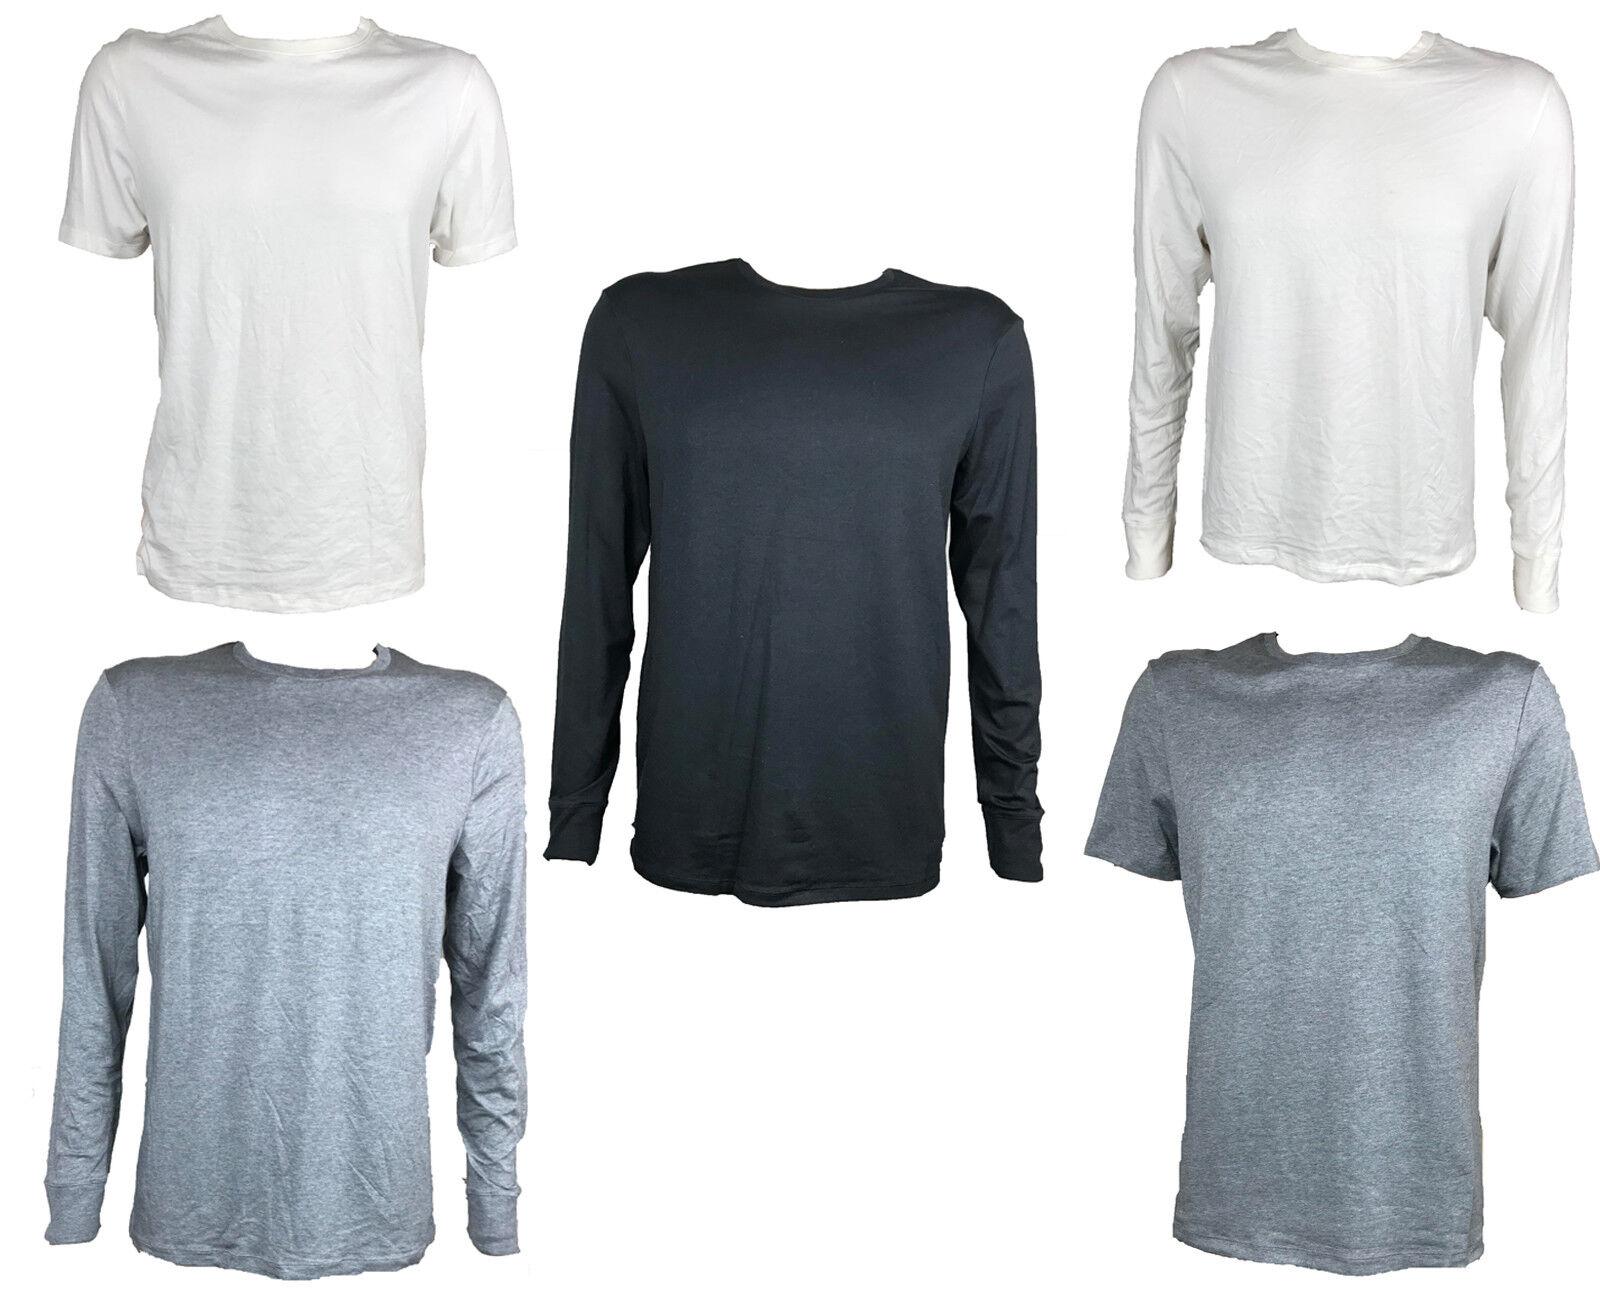 b4375fda8b11 Mens Thermal M&S Tops Ex Marks & Spencer Warm Long & Short Sleeves New